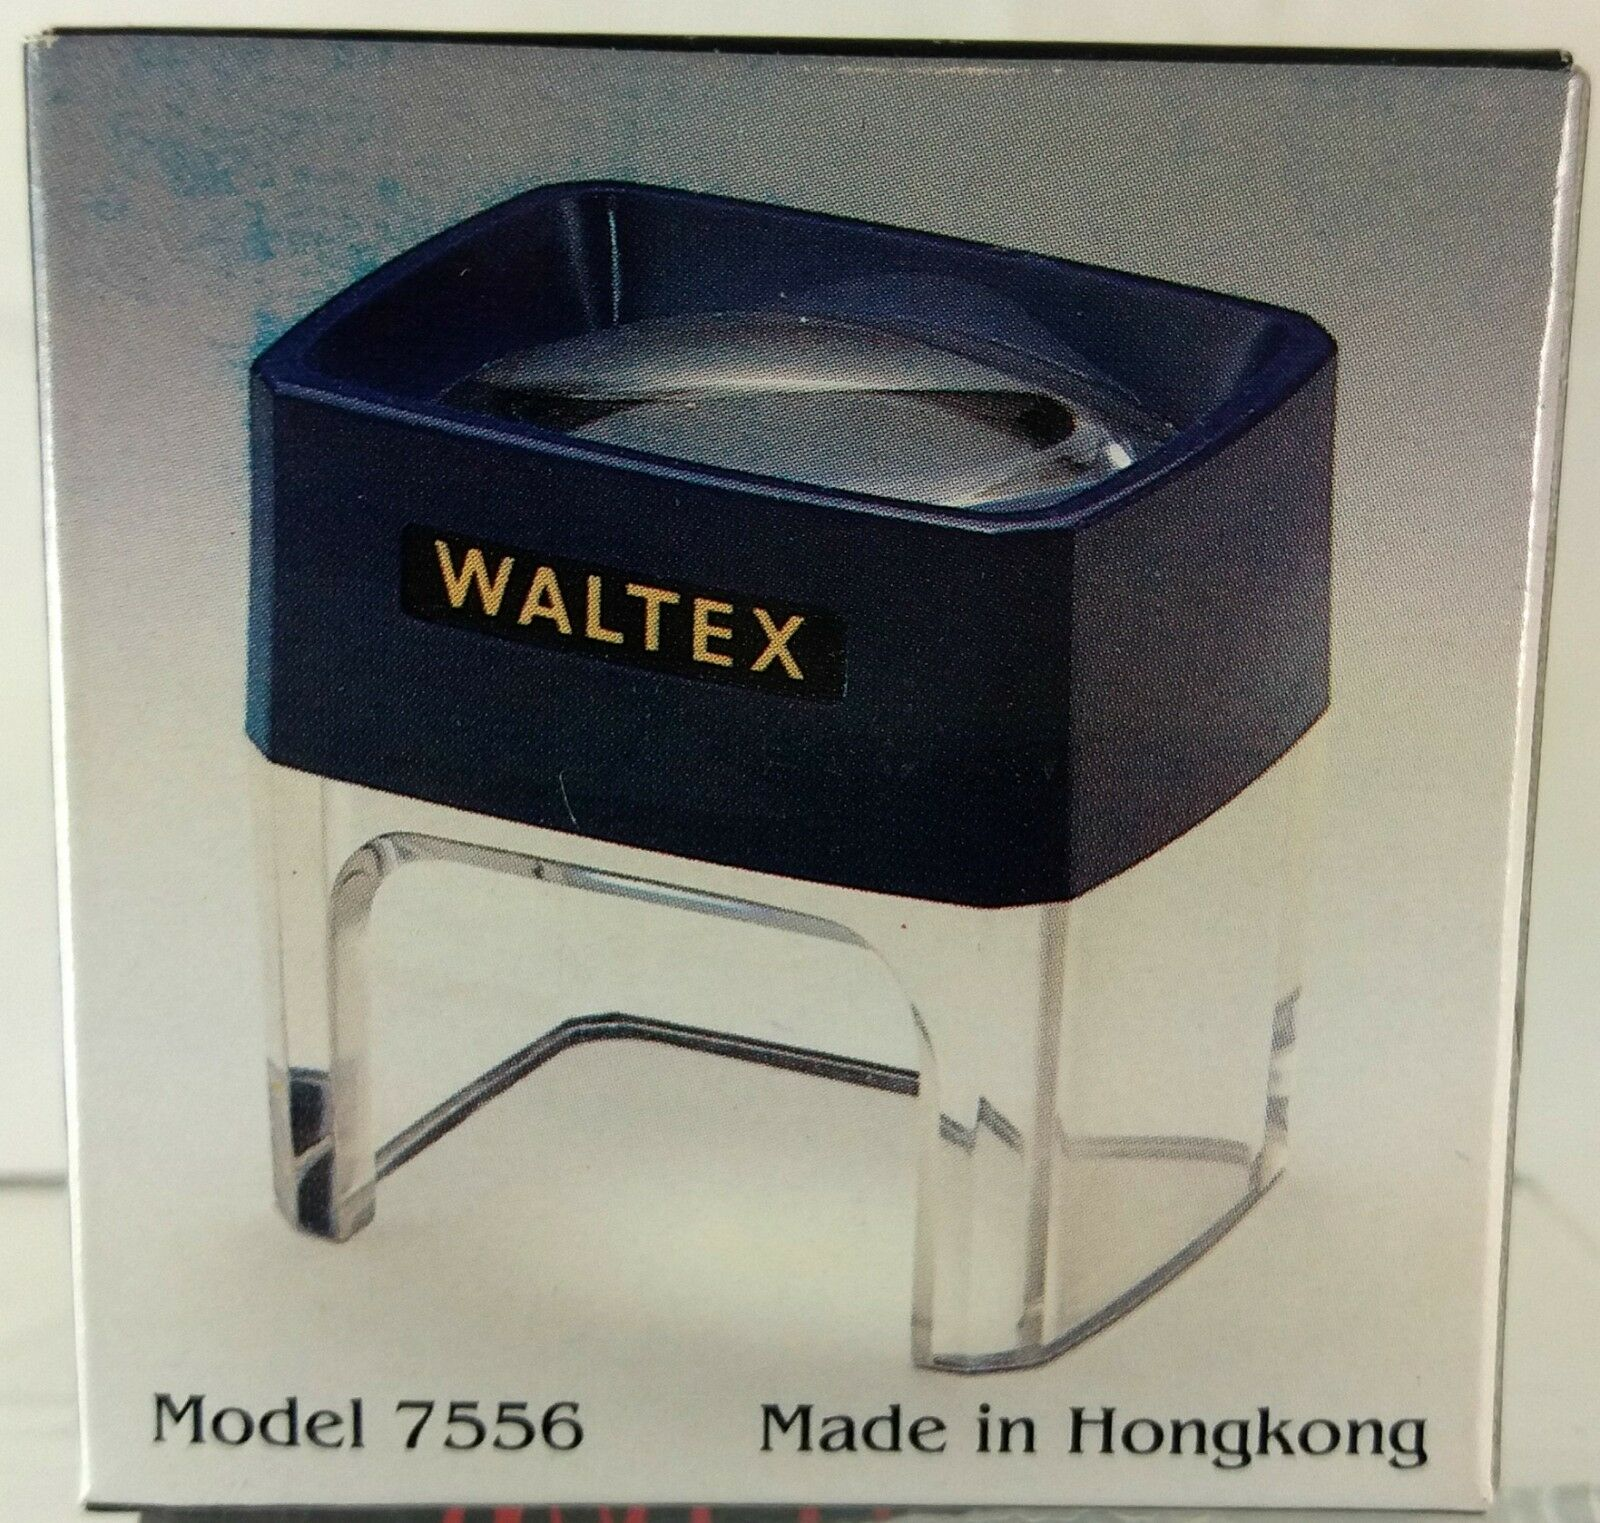 Waltex, Staand Vergrootglas, dradenteller met een vergroting van 3x (VG03)